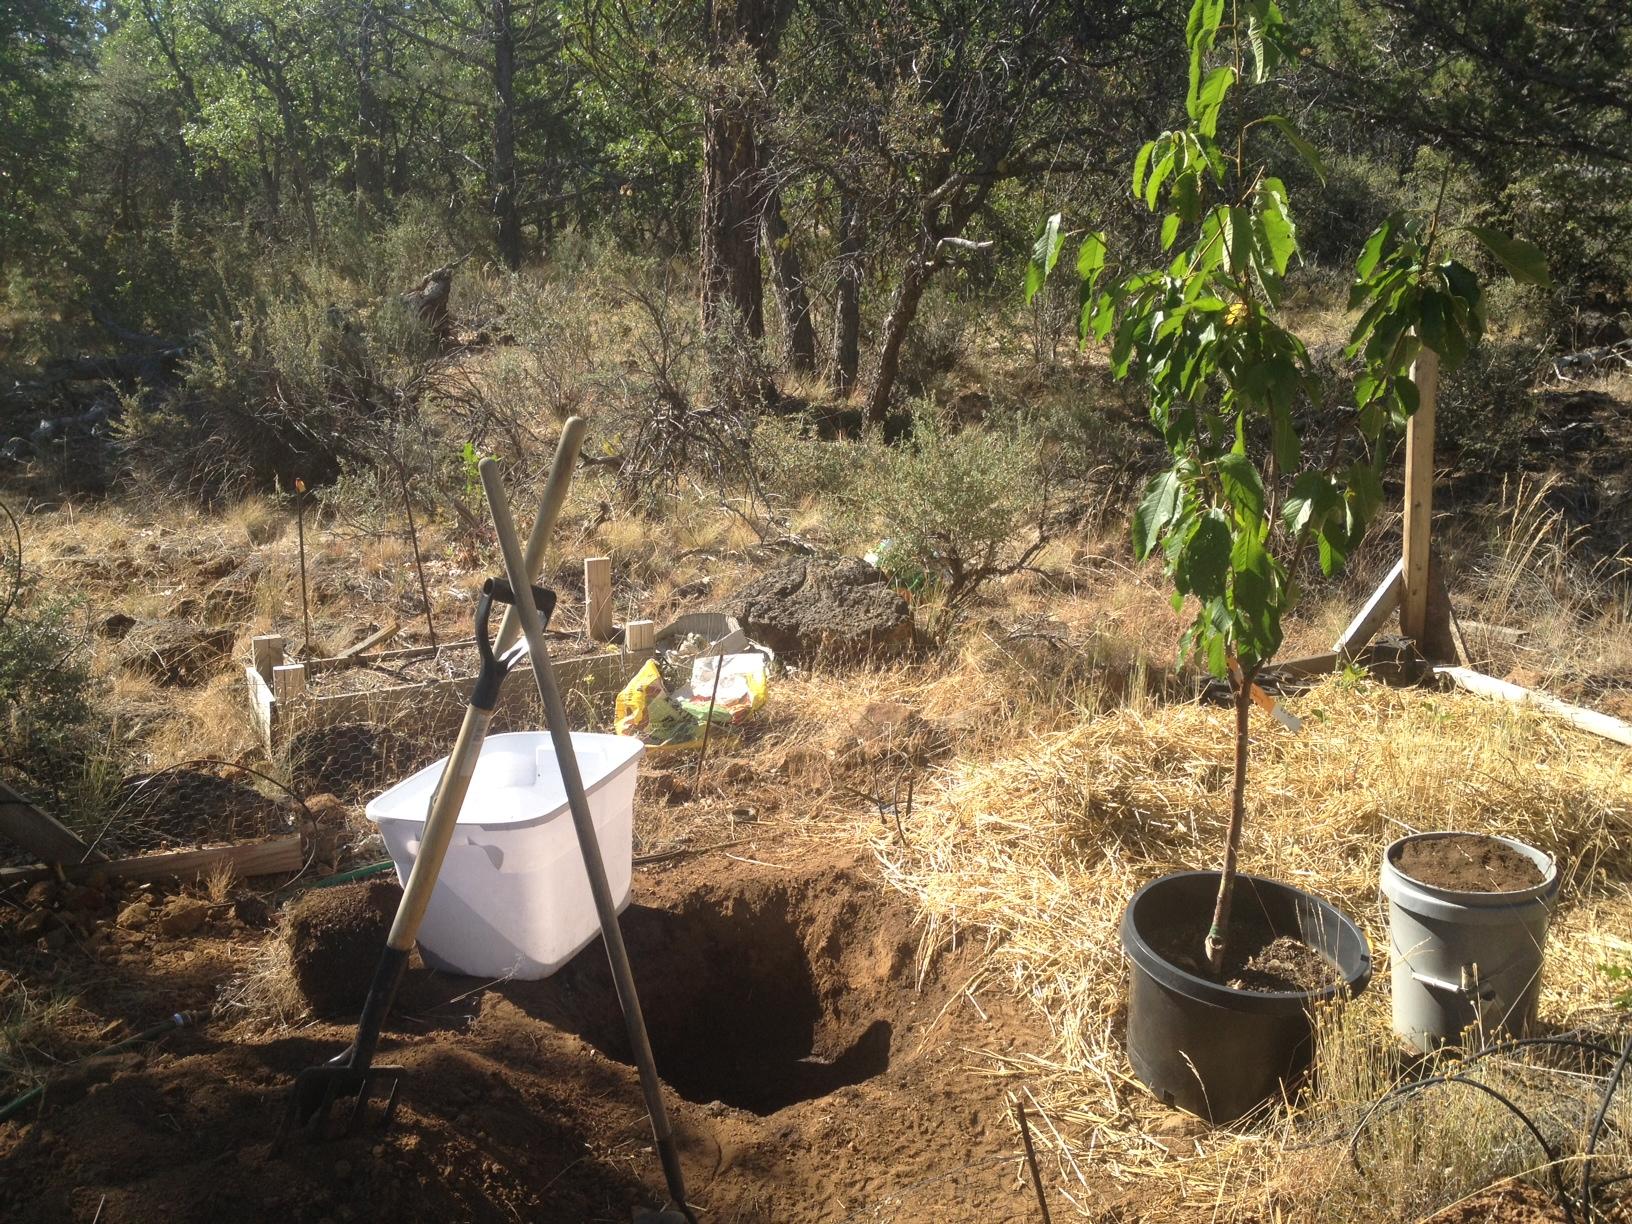 яма и саженец вишни для посадки